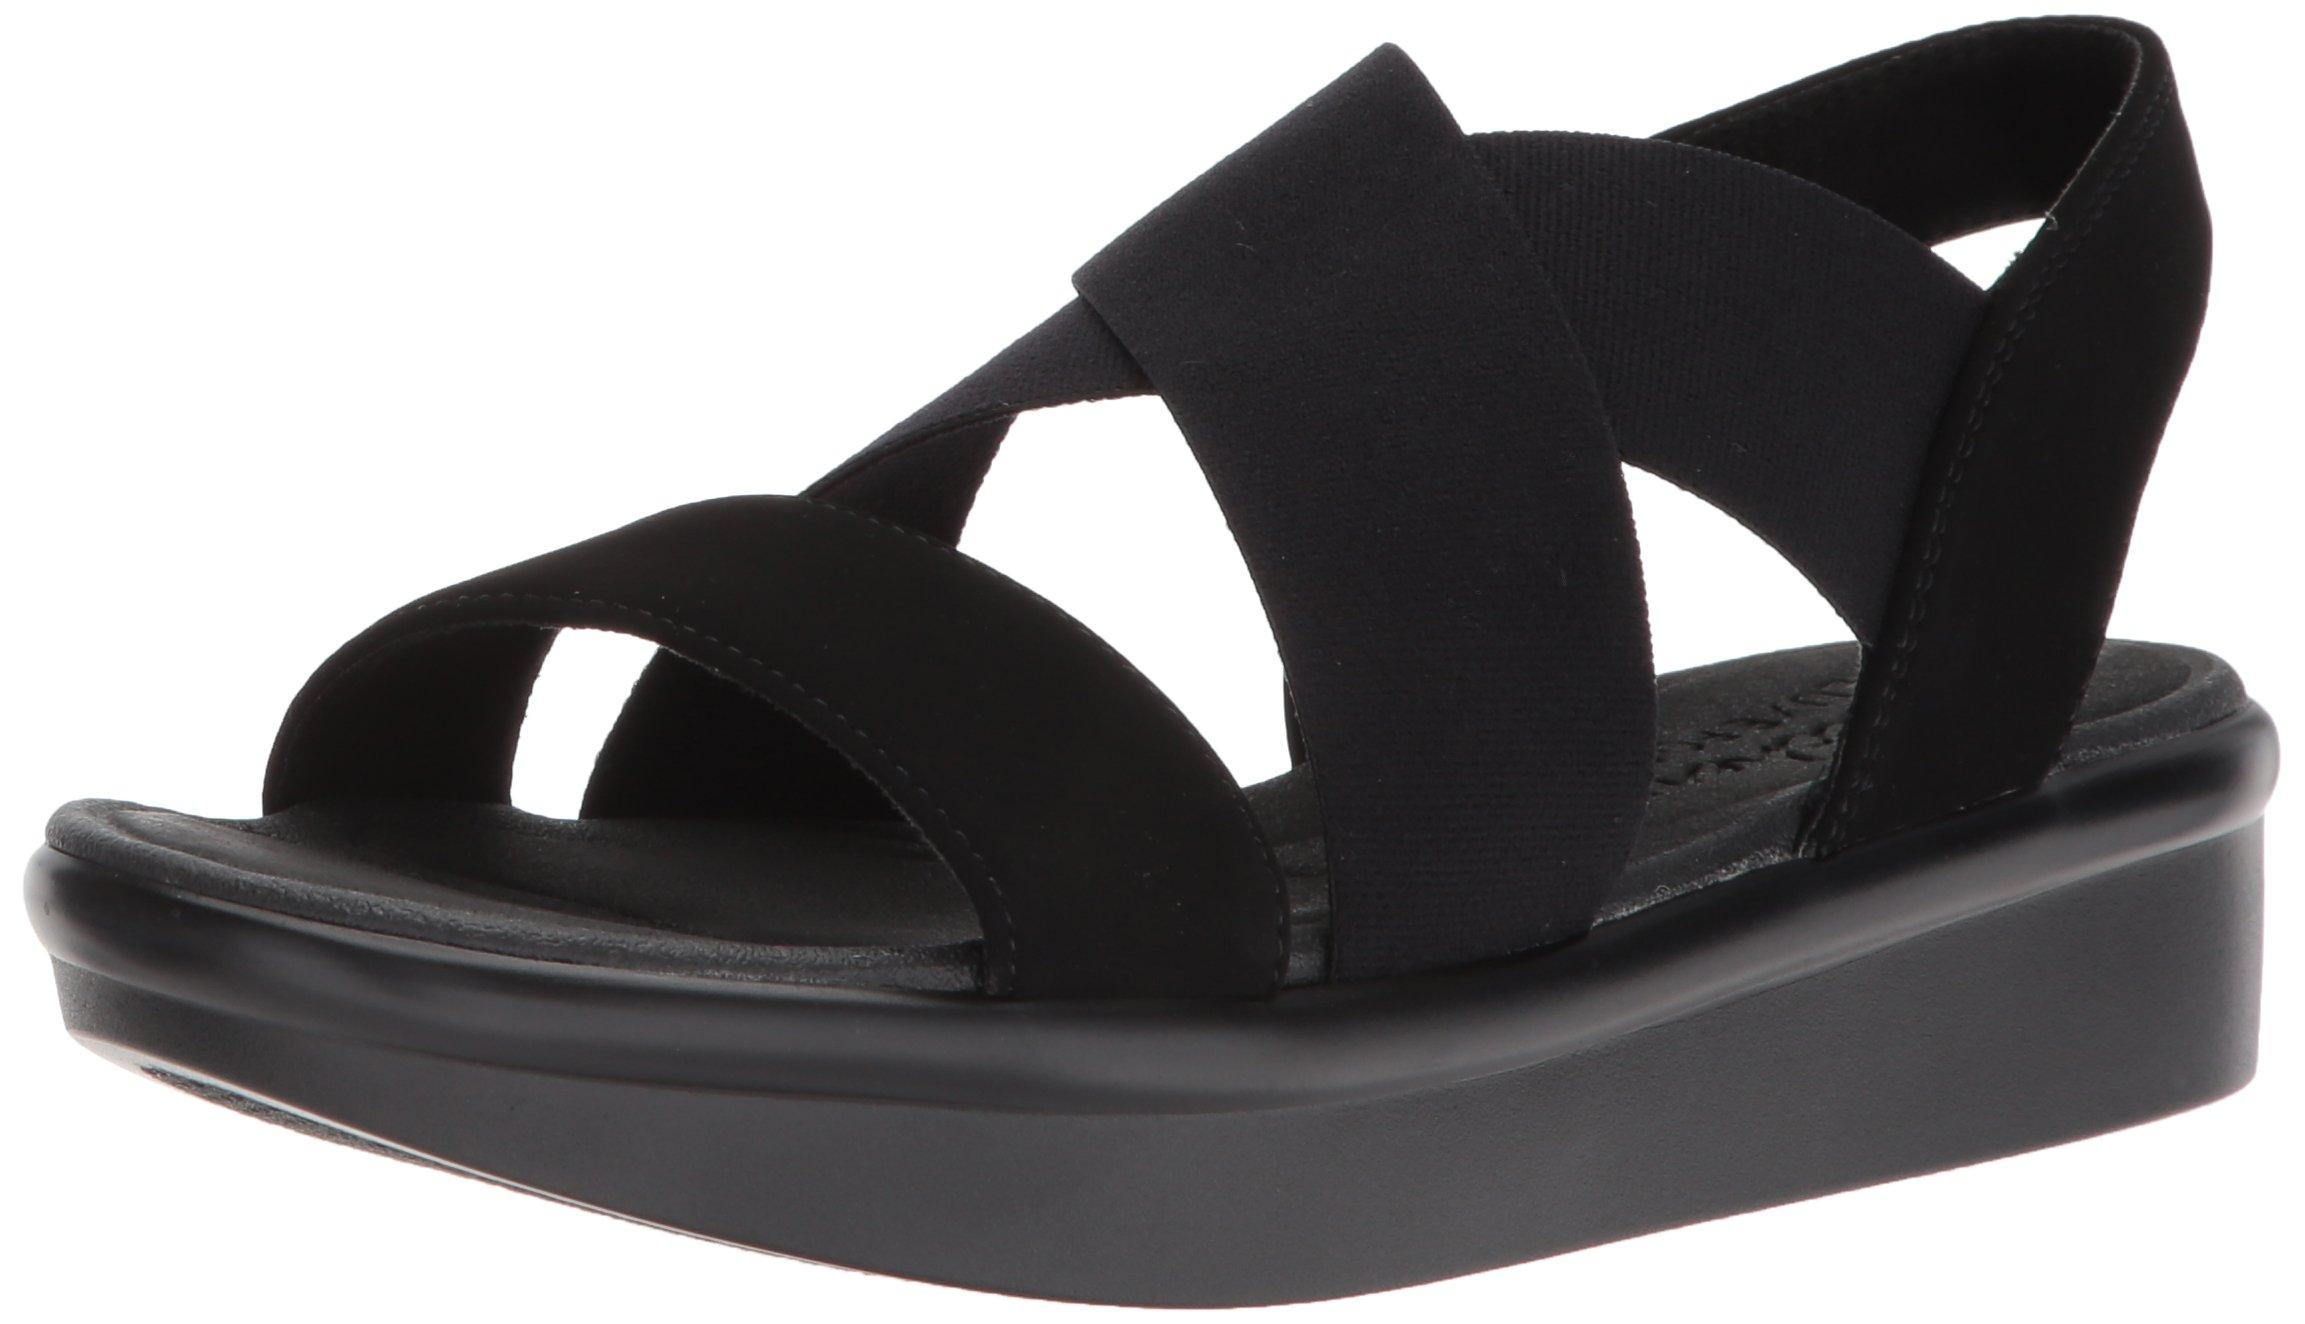 Skechers Cali Women's Bumblers-Super Style Sandal,Black/Black,8 M US